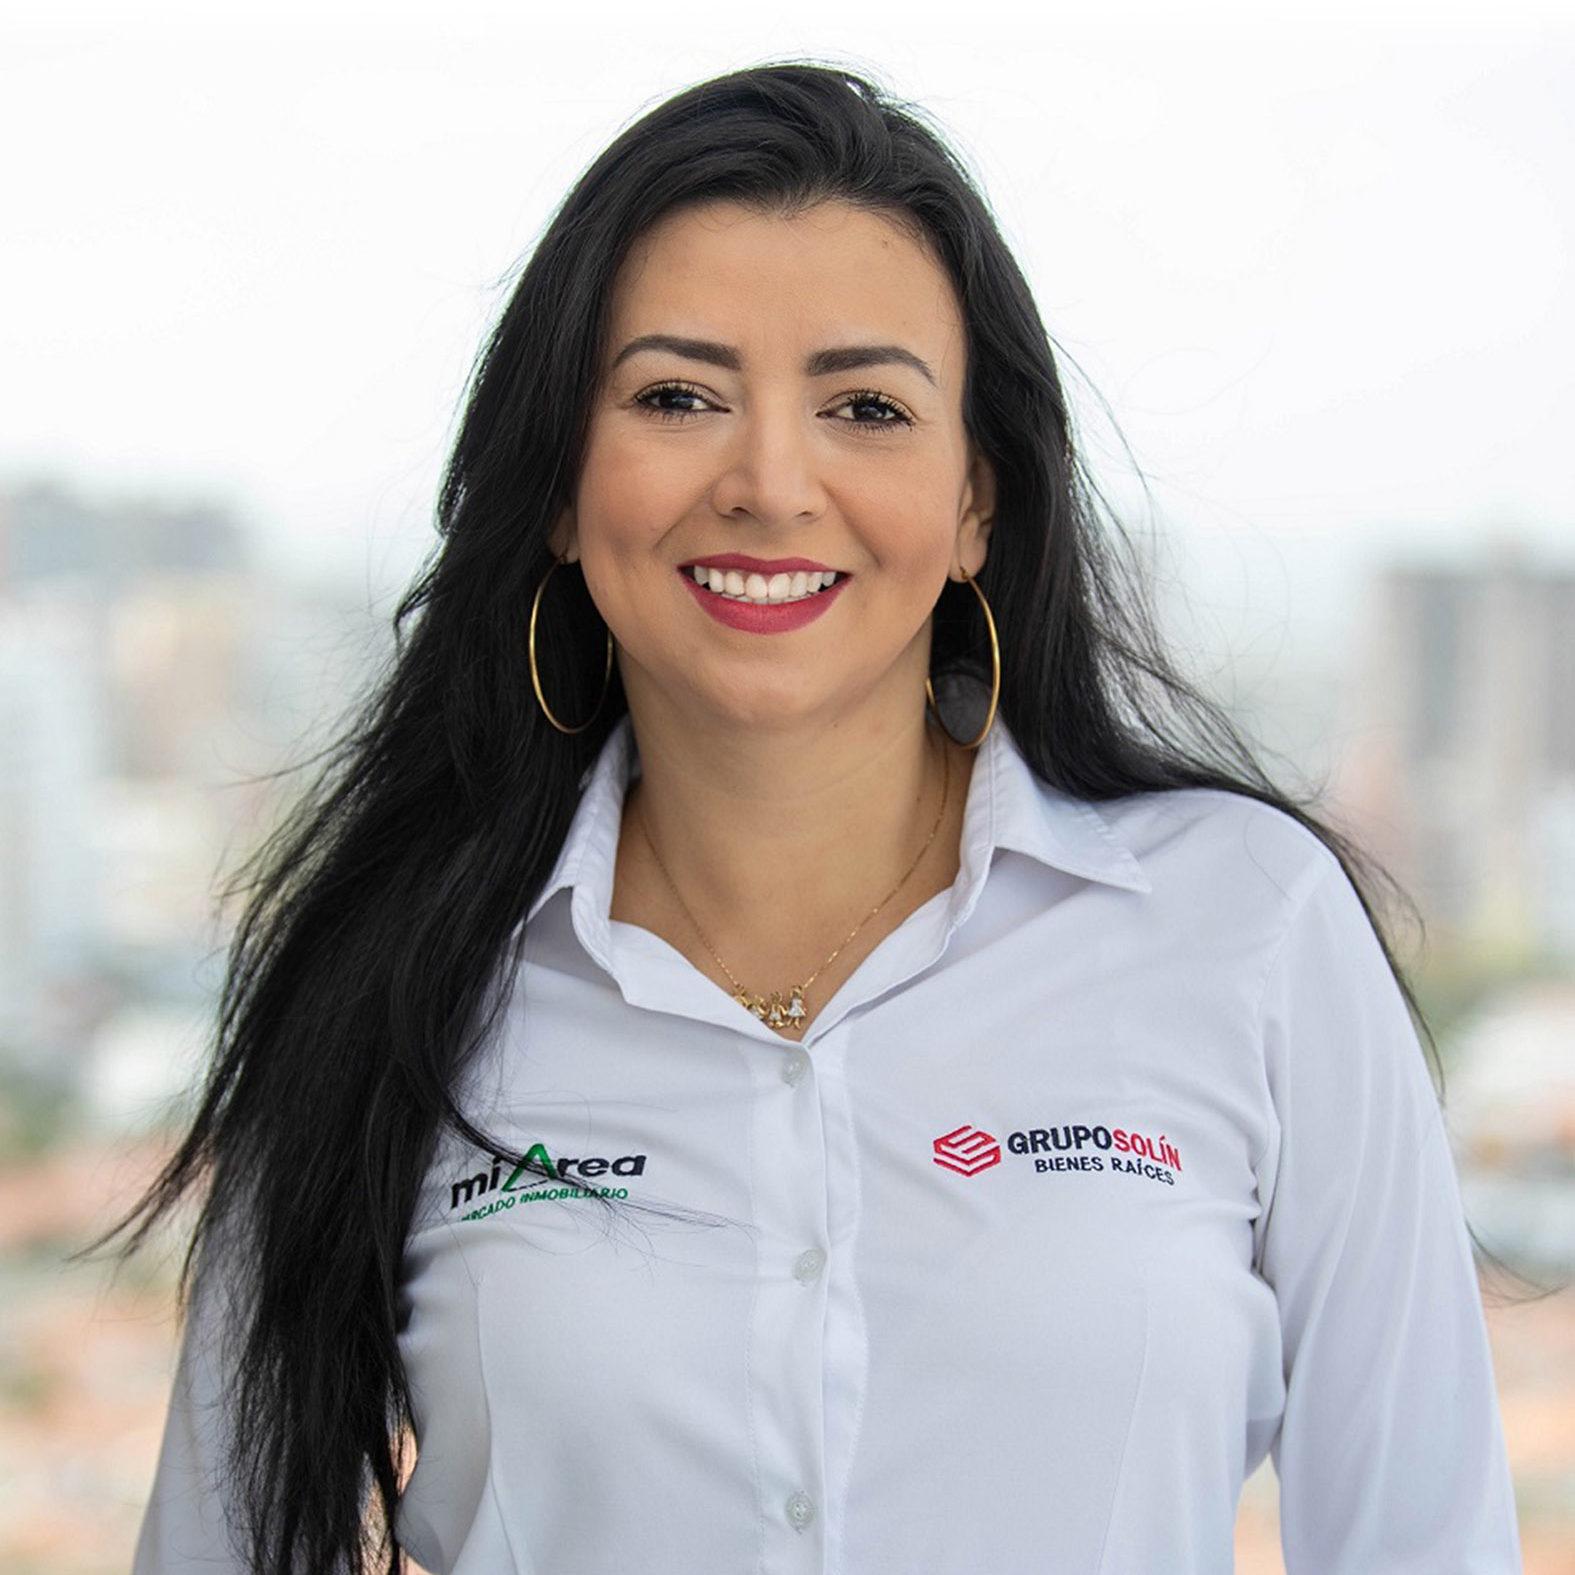 Milena Paez - Grupo Solin